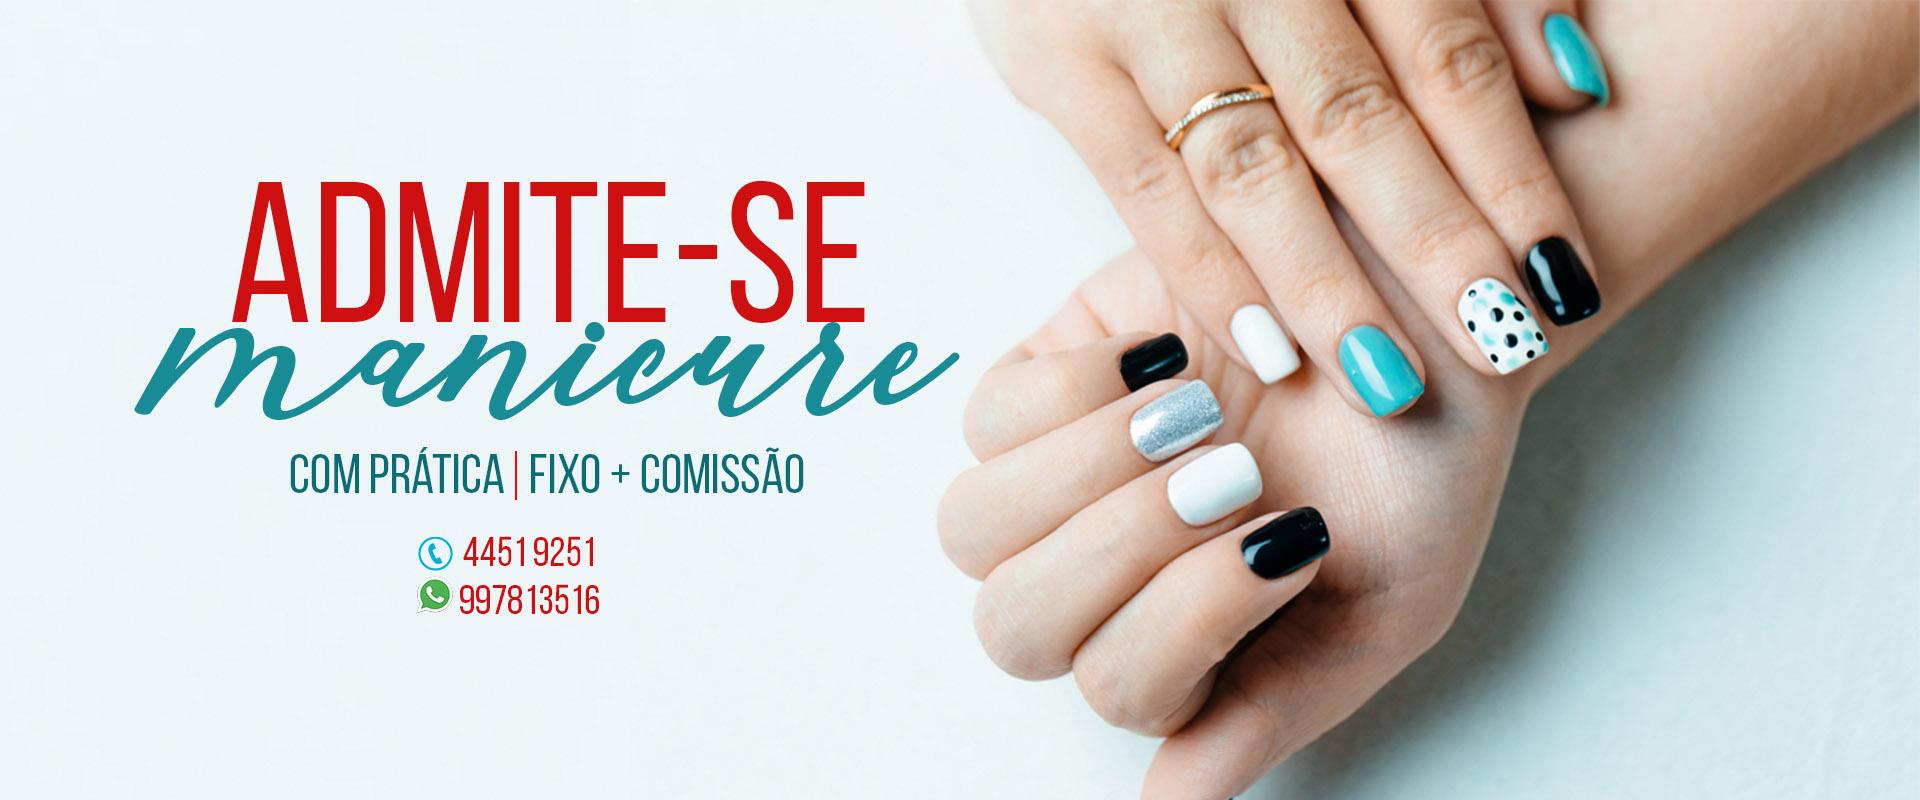 manicure_admite-se